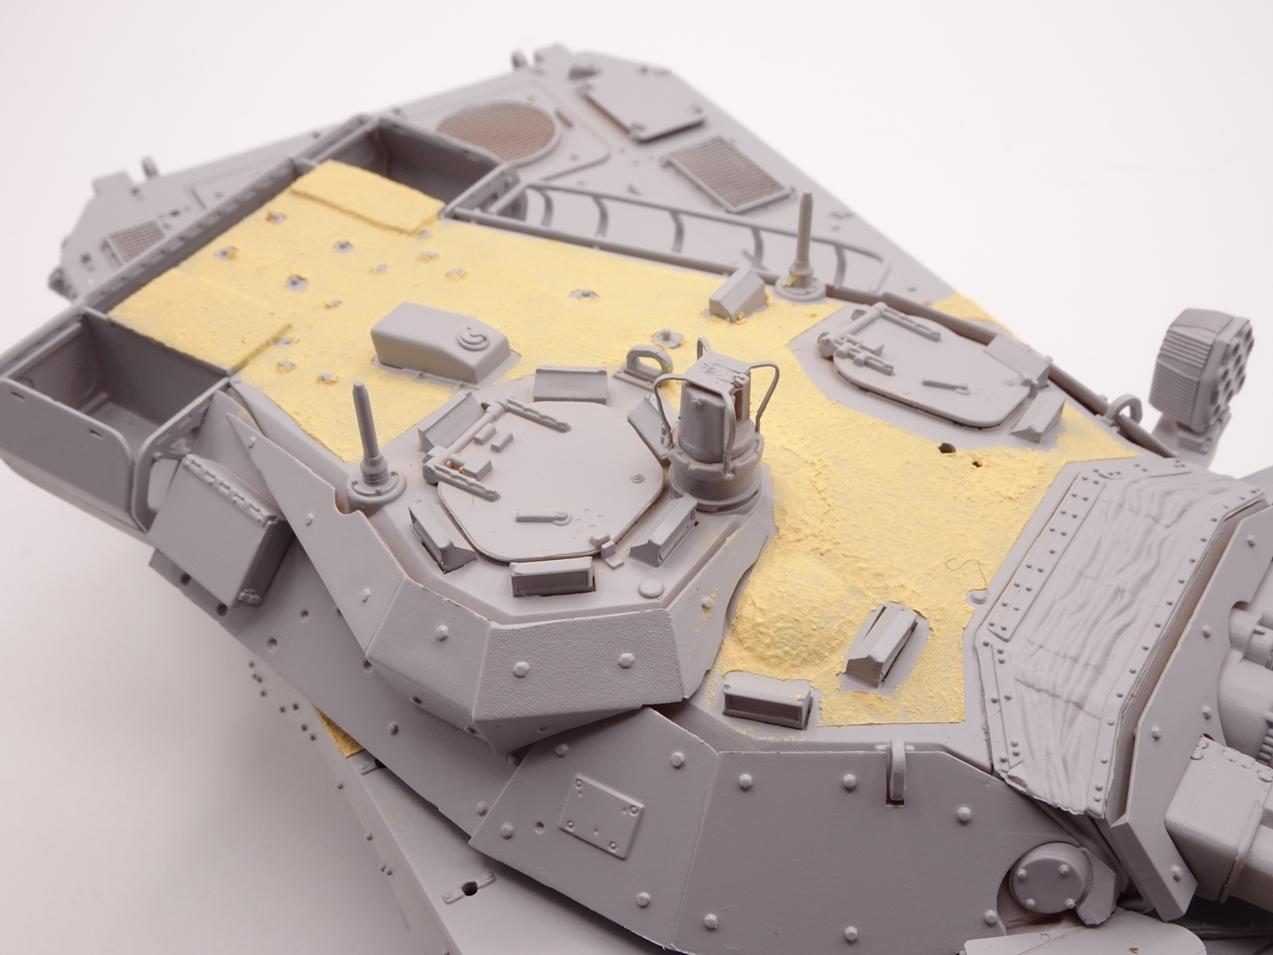 [Tiger Model] AMX-10RCR réf. 4602 - 1/35 - Page 3 Amw10-2807-3